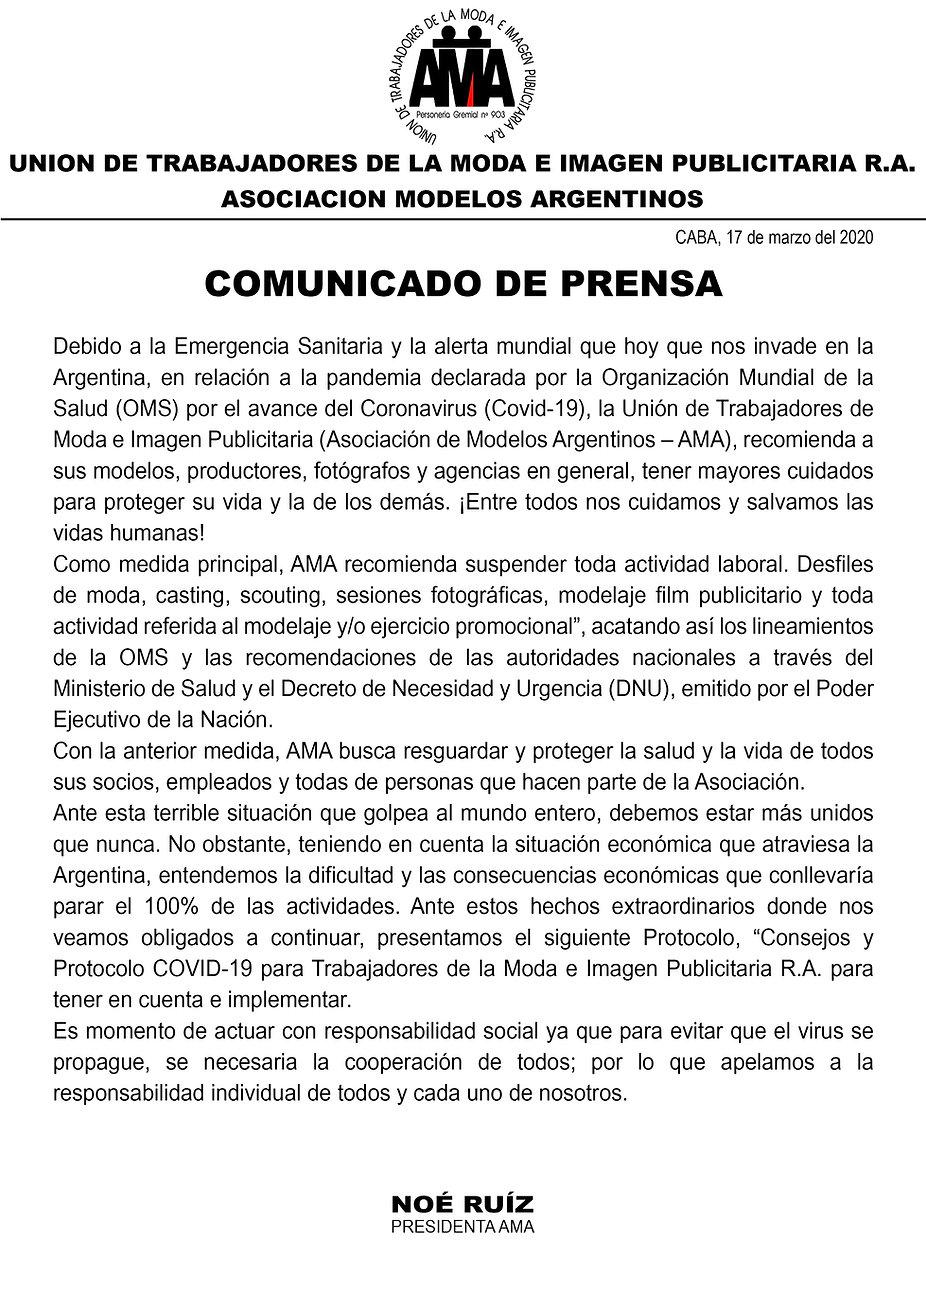 COMUNICADO DE PRENSA COVID19.jpg